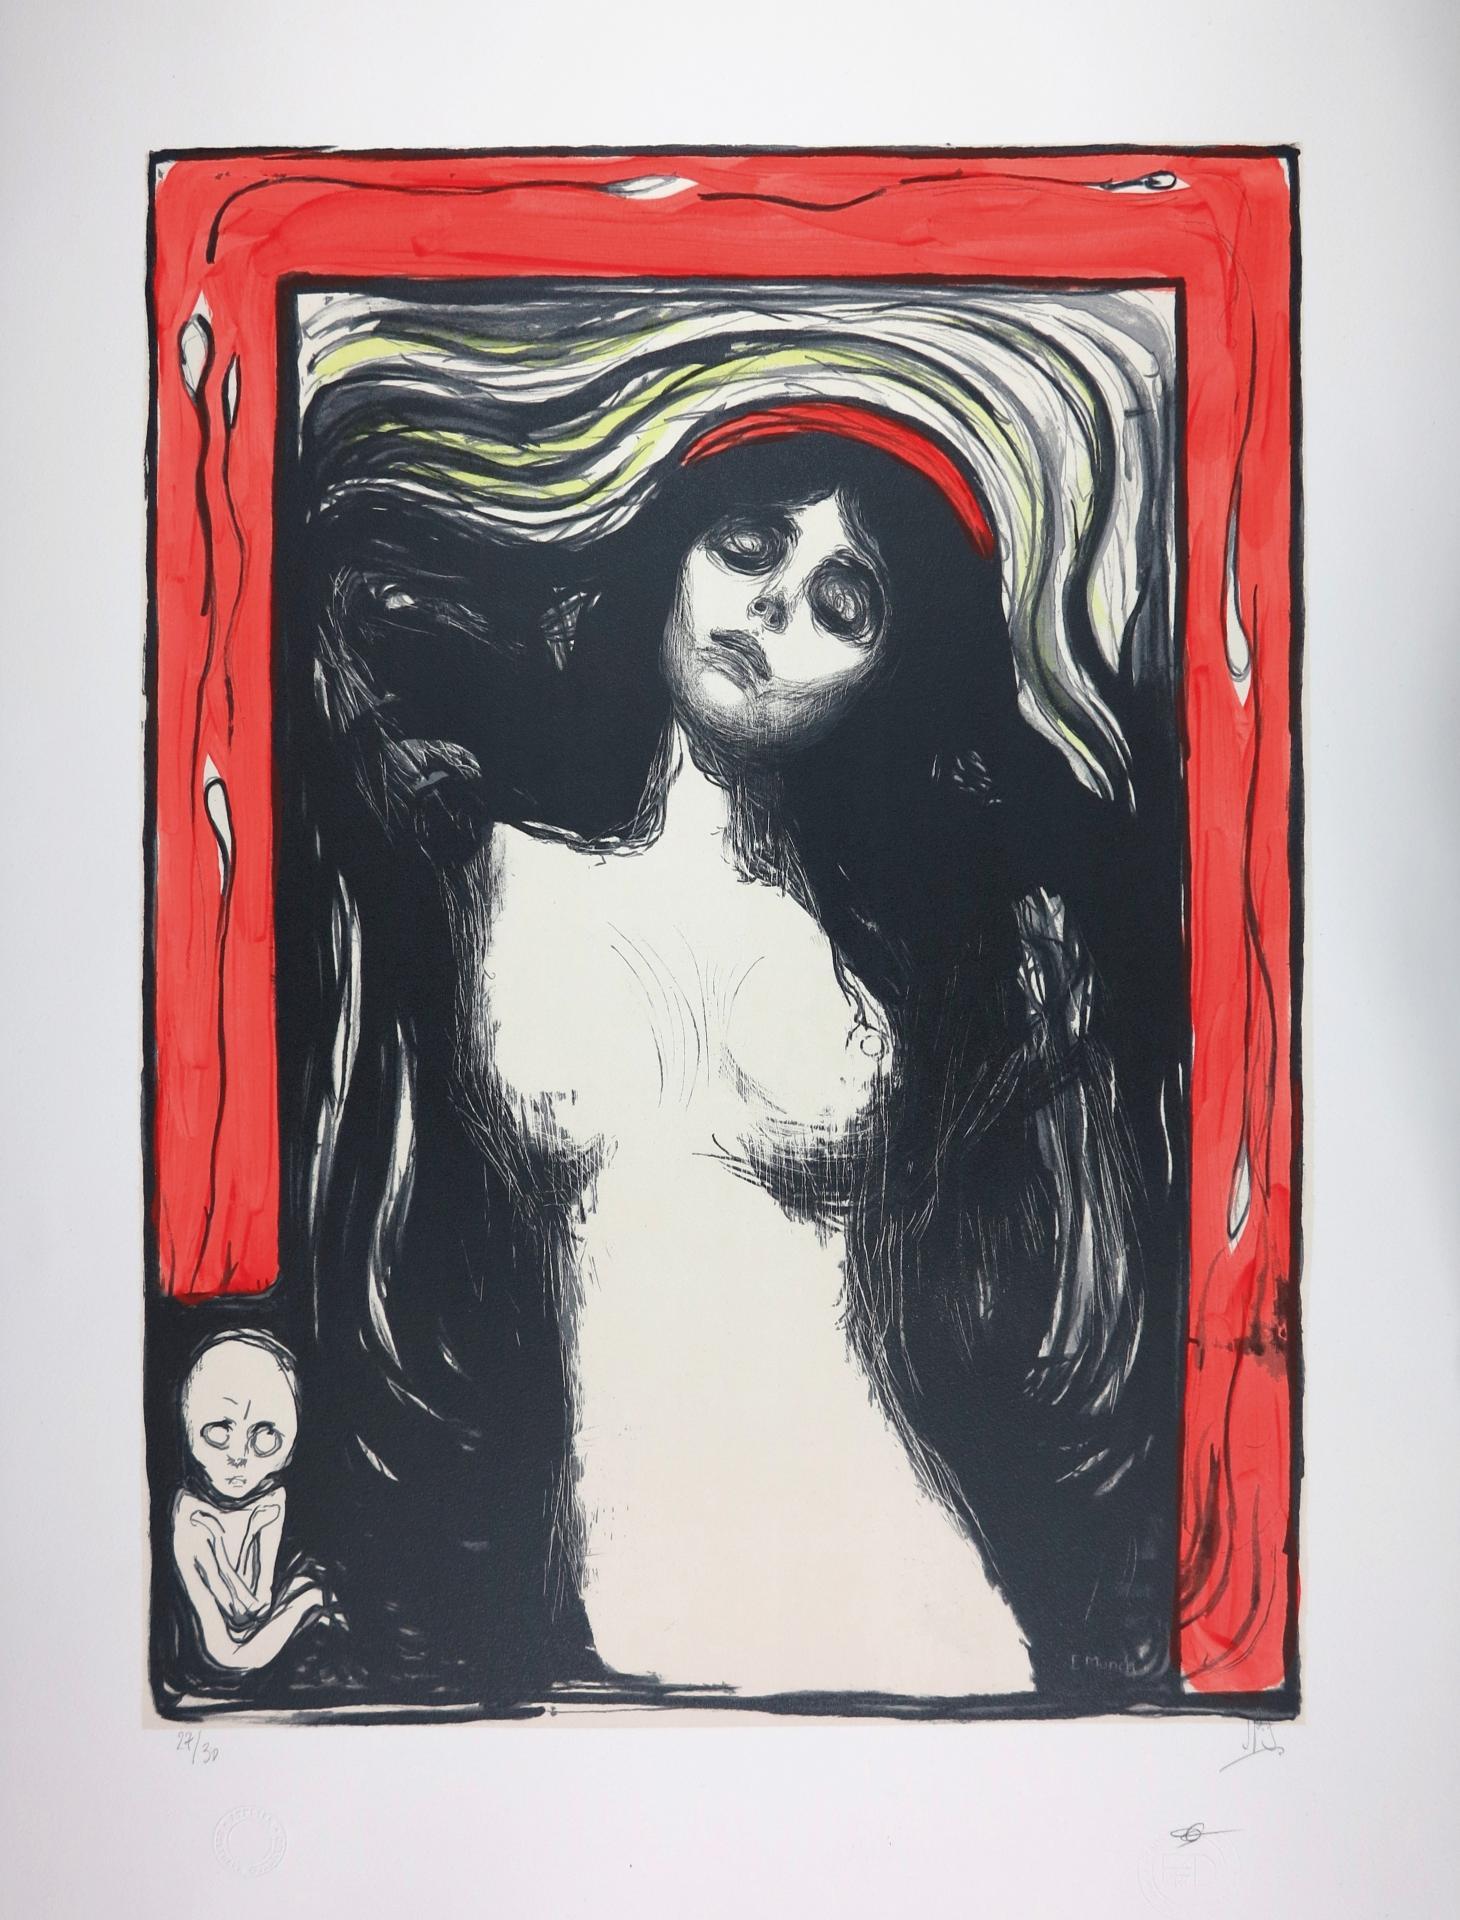 EDVARD MUNCH | Madonna, 1895 | Lithograph